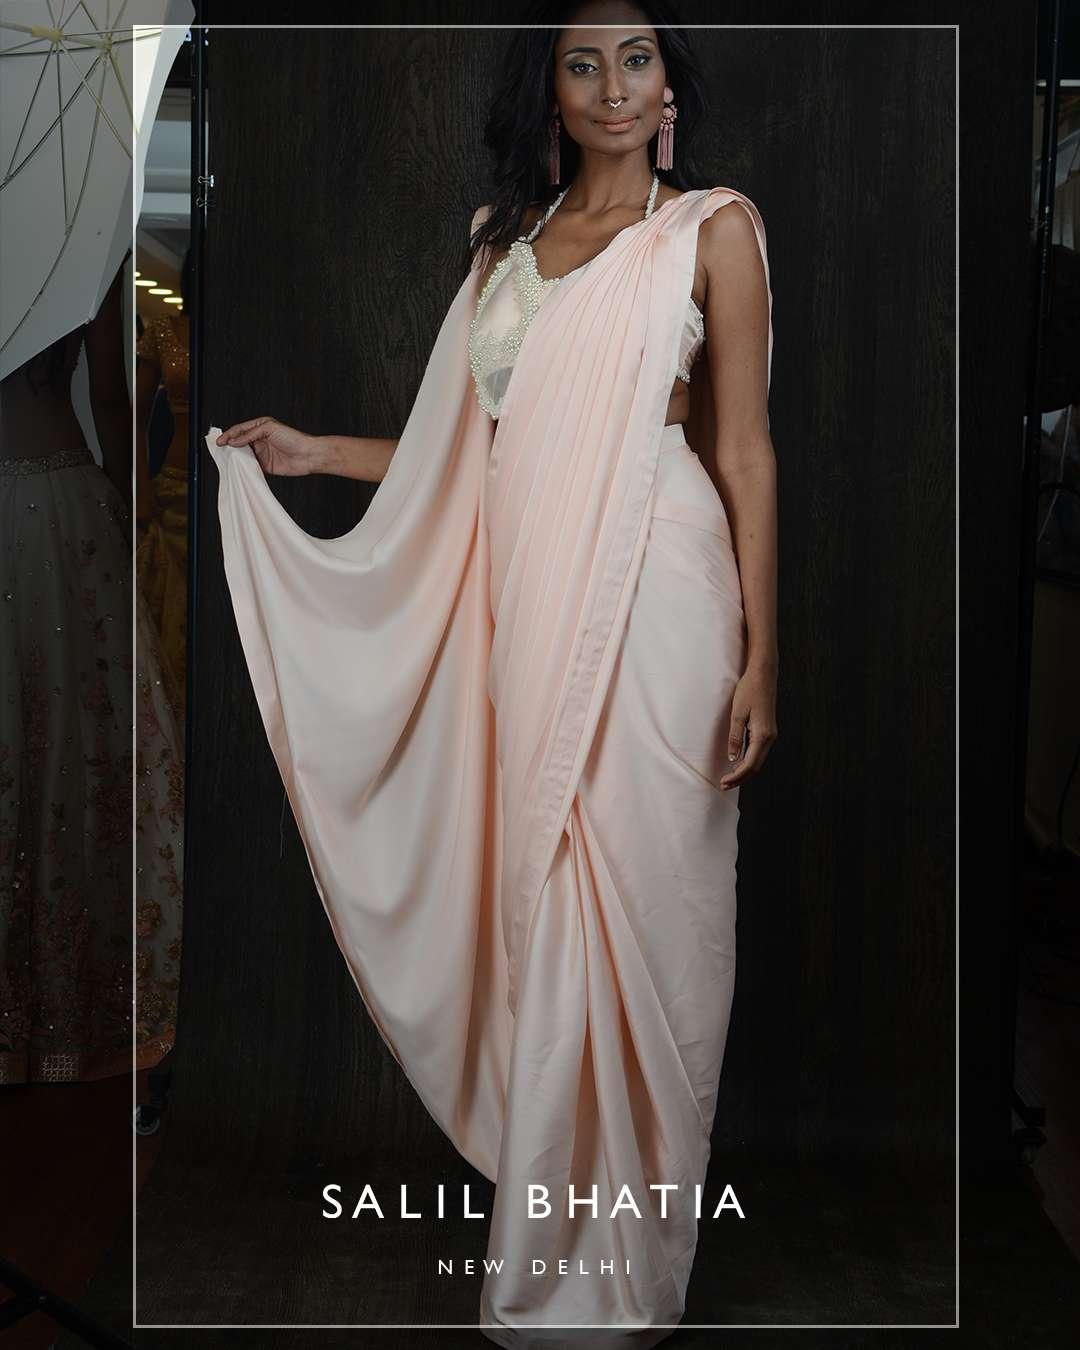 Portfolio - REPTILIA by Salil Bhatia